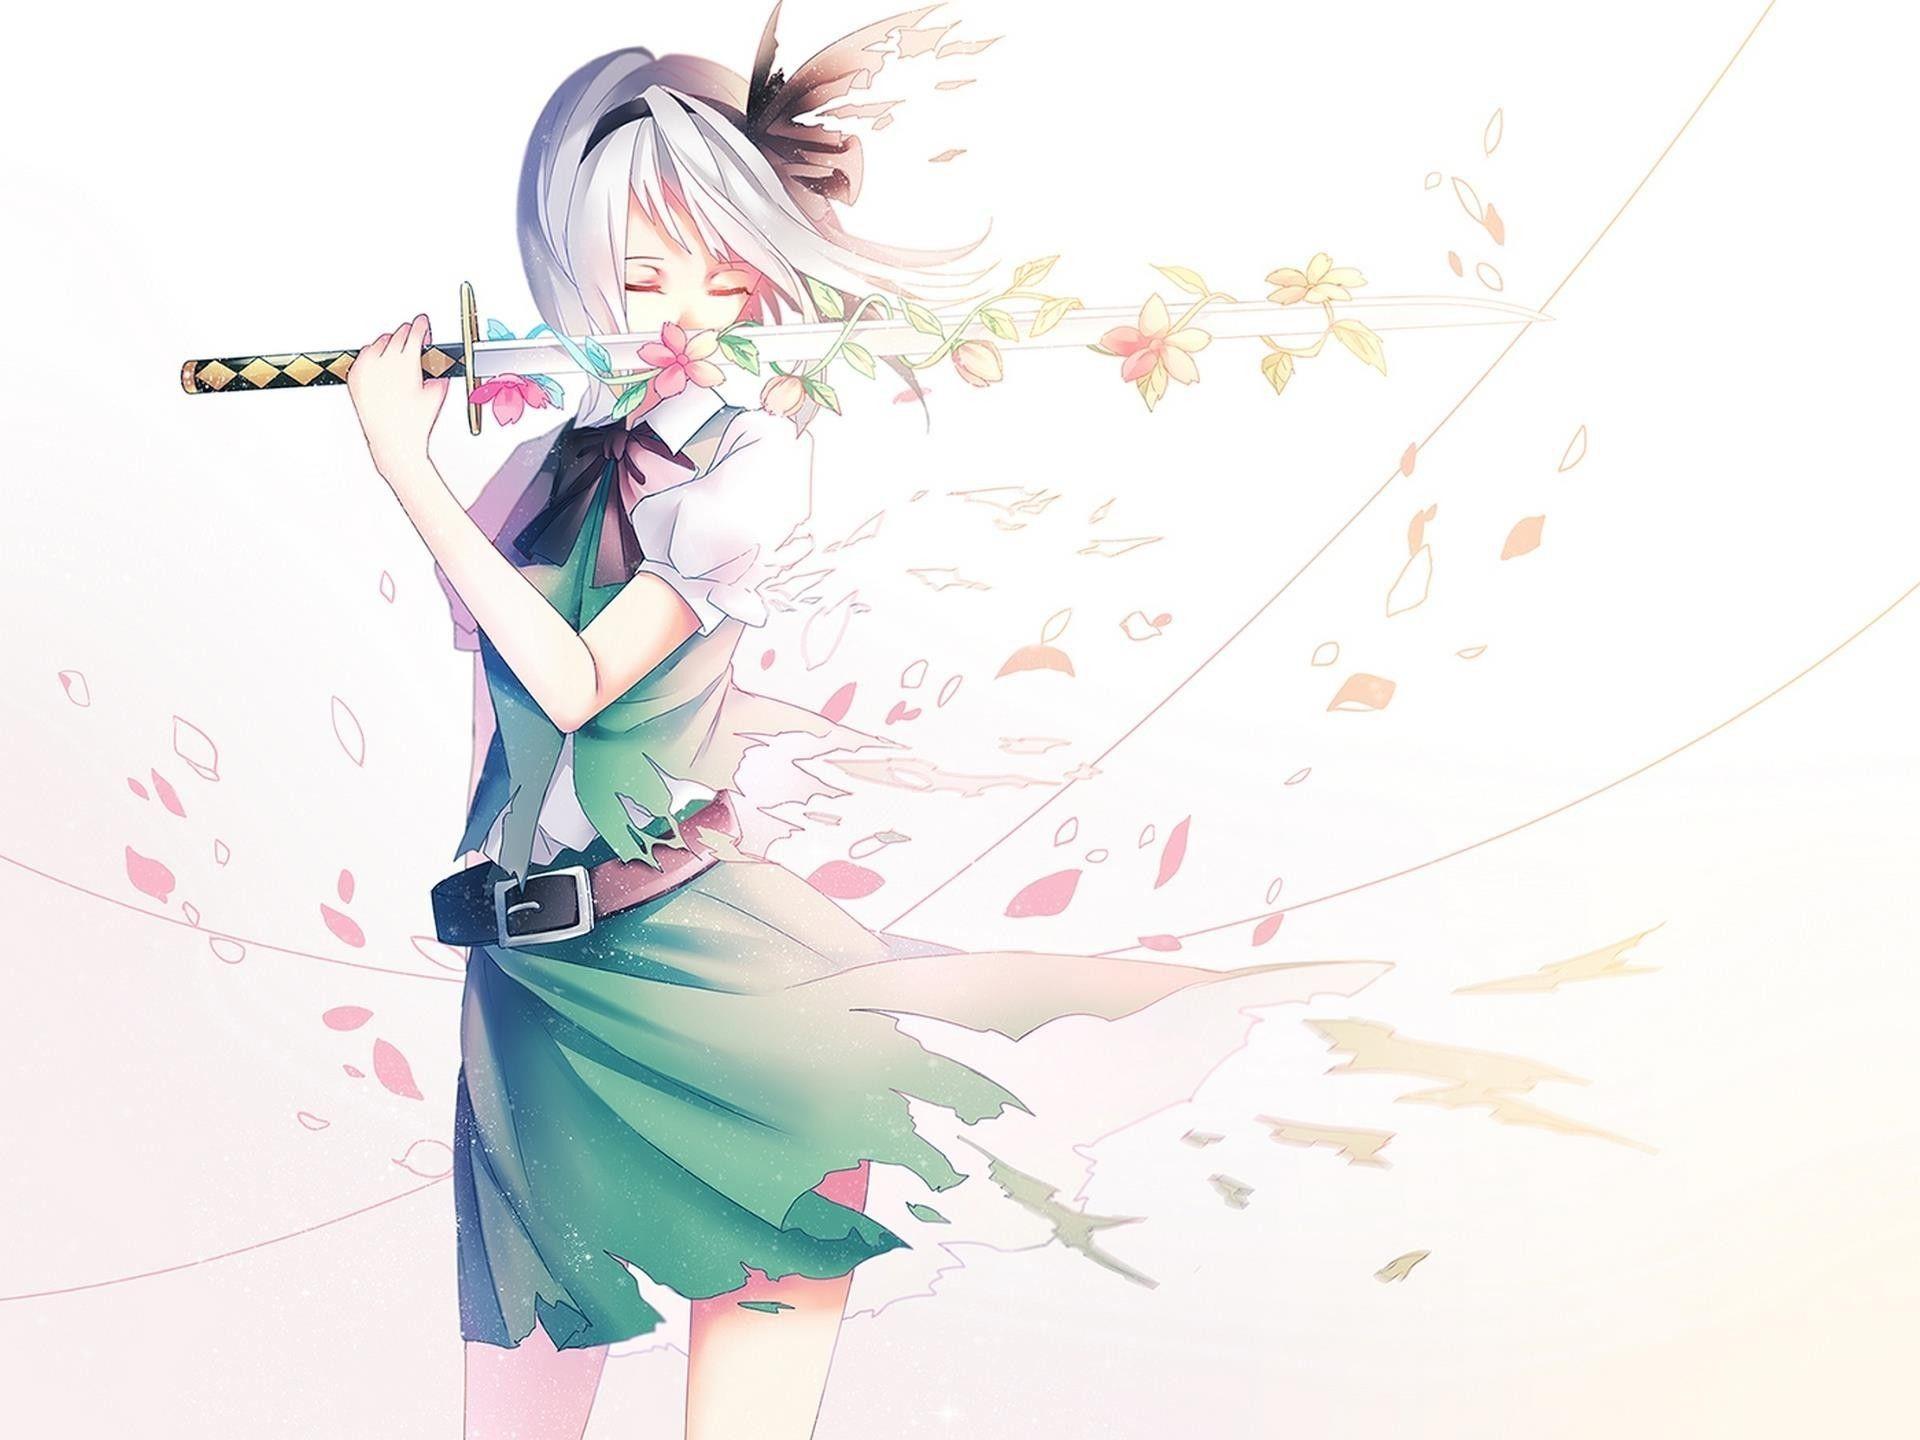 Anime girl with flower sword desktop background wallpapers - Girl with sword wallpaper ...